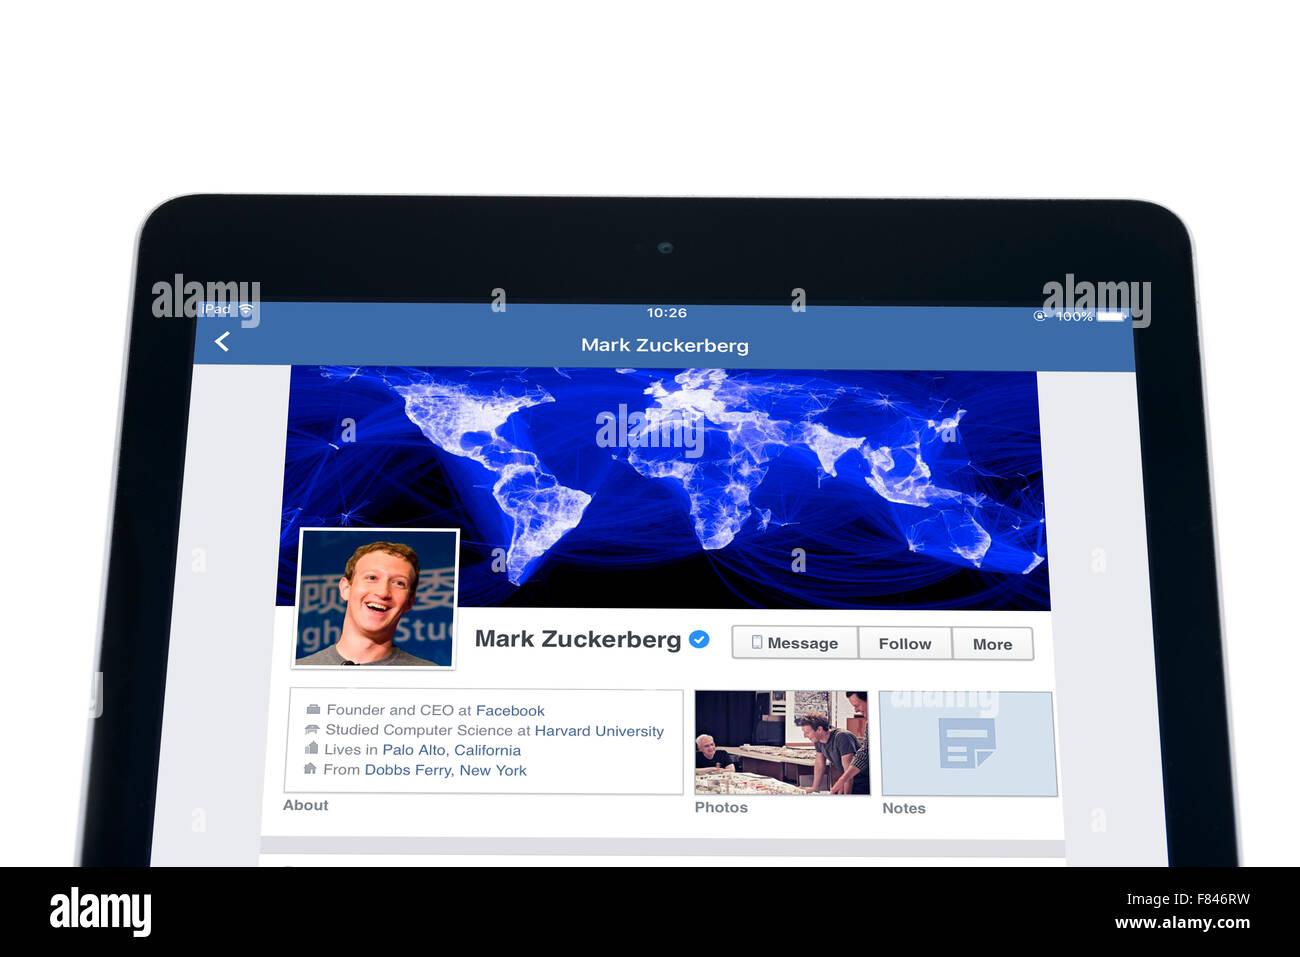 Mark Zuckerberg's website on the Facebook app, viewed on an iPad Air - Stock Image